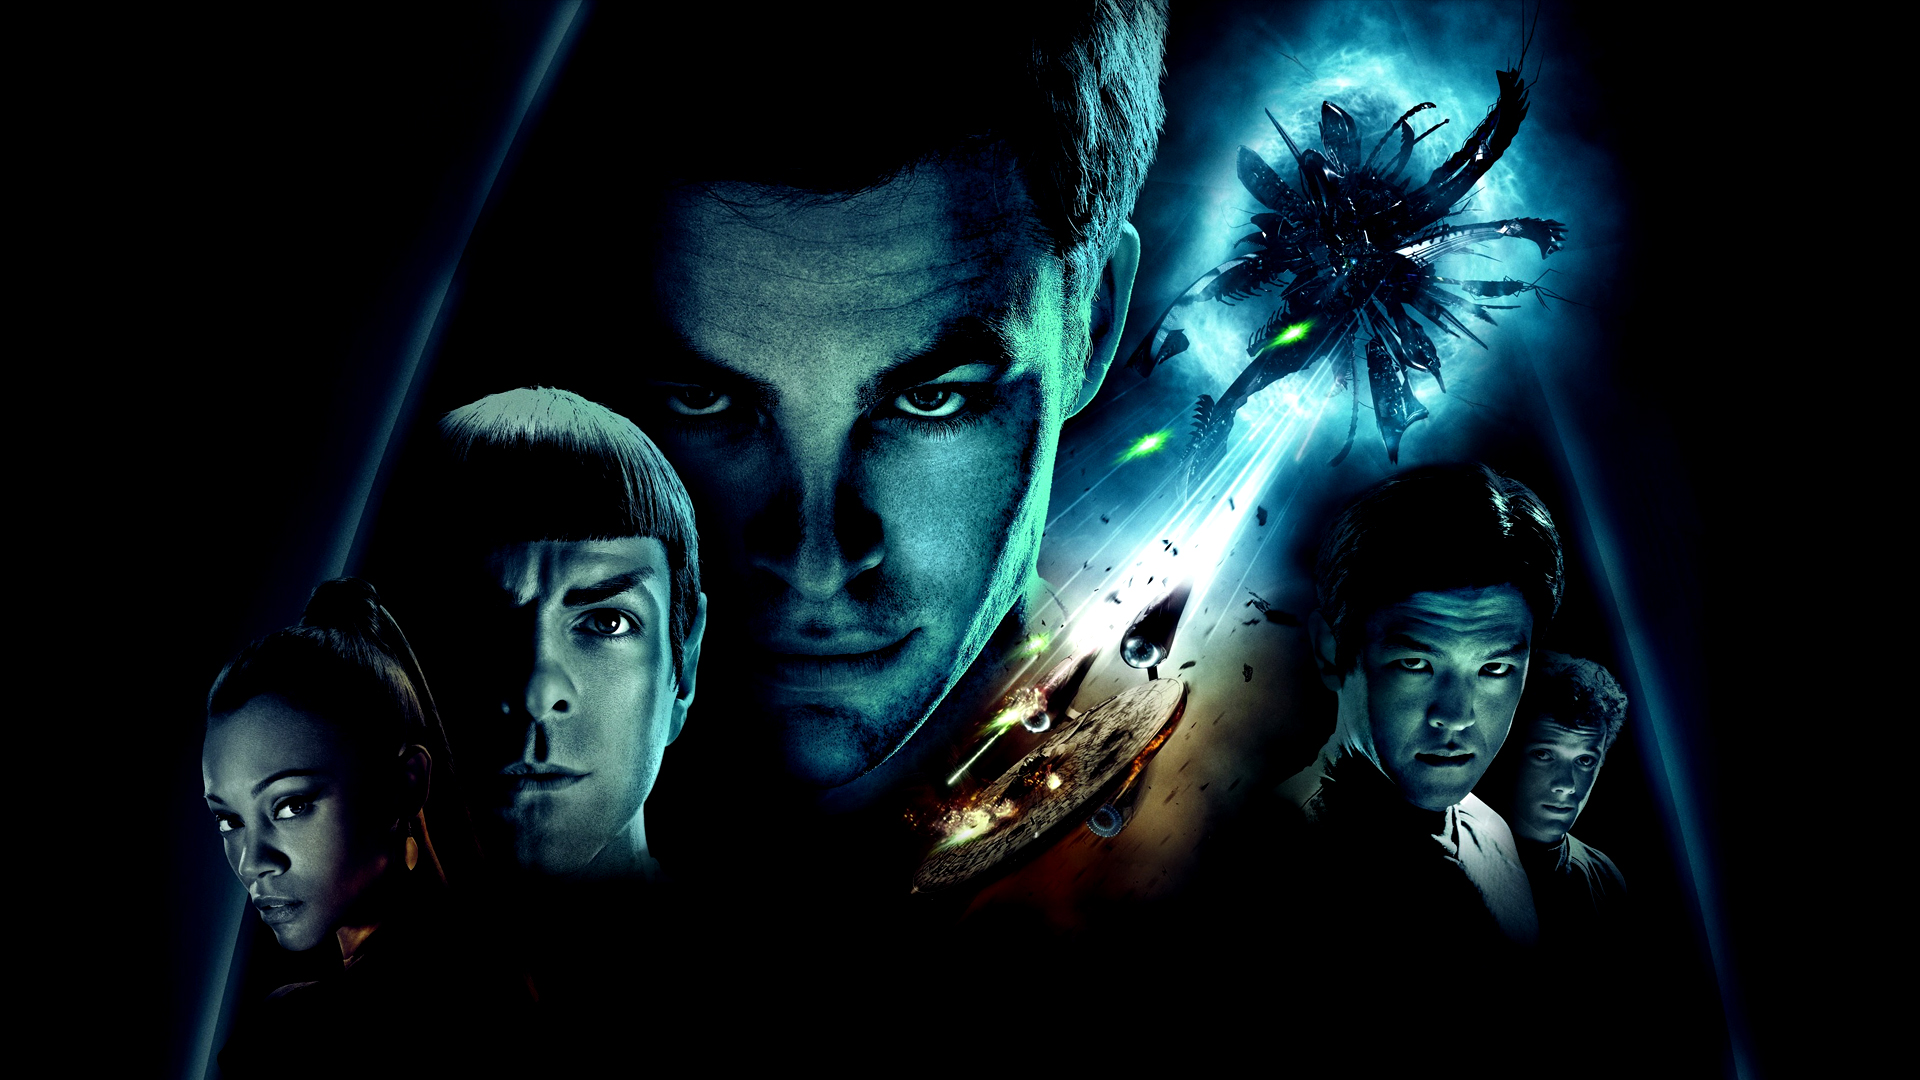 Star Trek 2009 Wallpaper wallpaper wallpaper hd 1920x1080